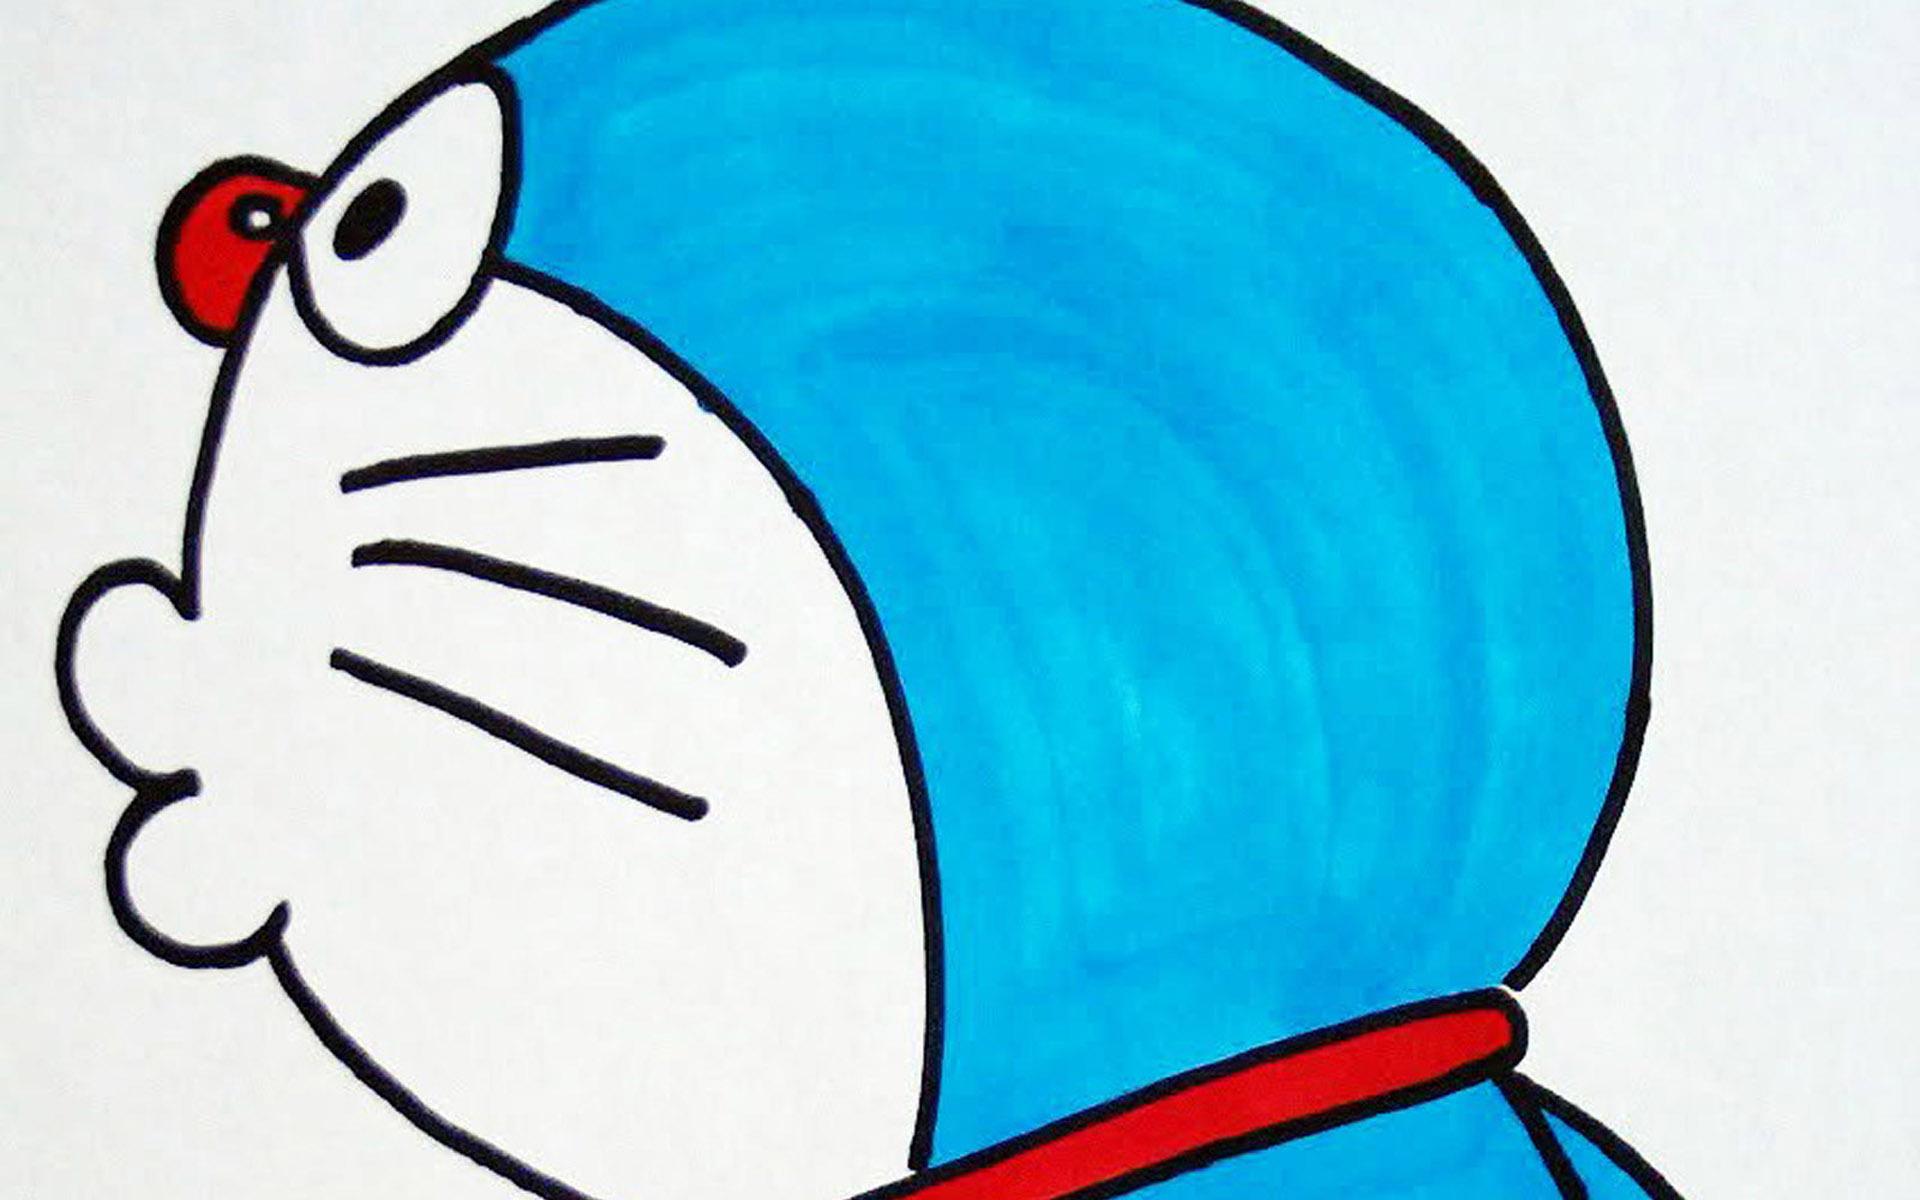 Cool Quotes Wallpapers For Desktop Doraemon Wallpaper Desktop Pc 6137 Wallpaper Walldiskpaper